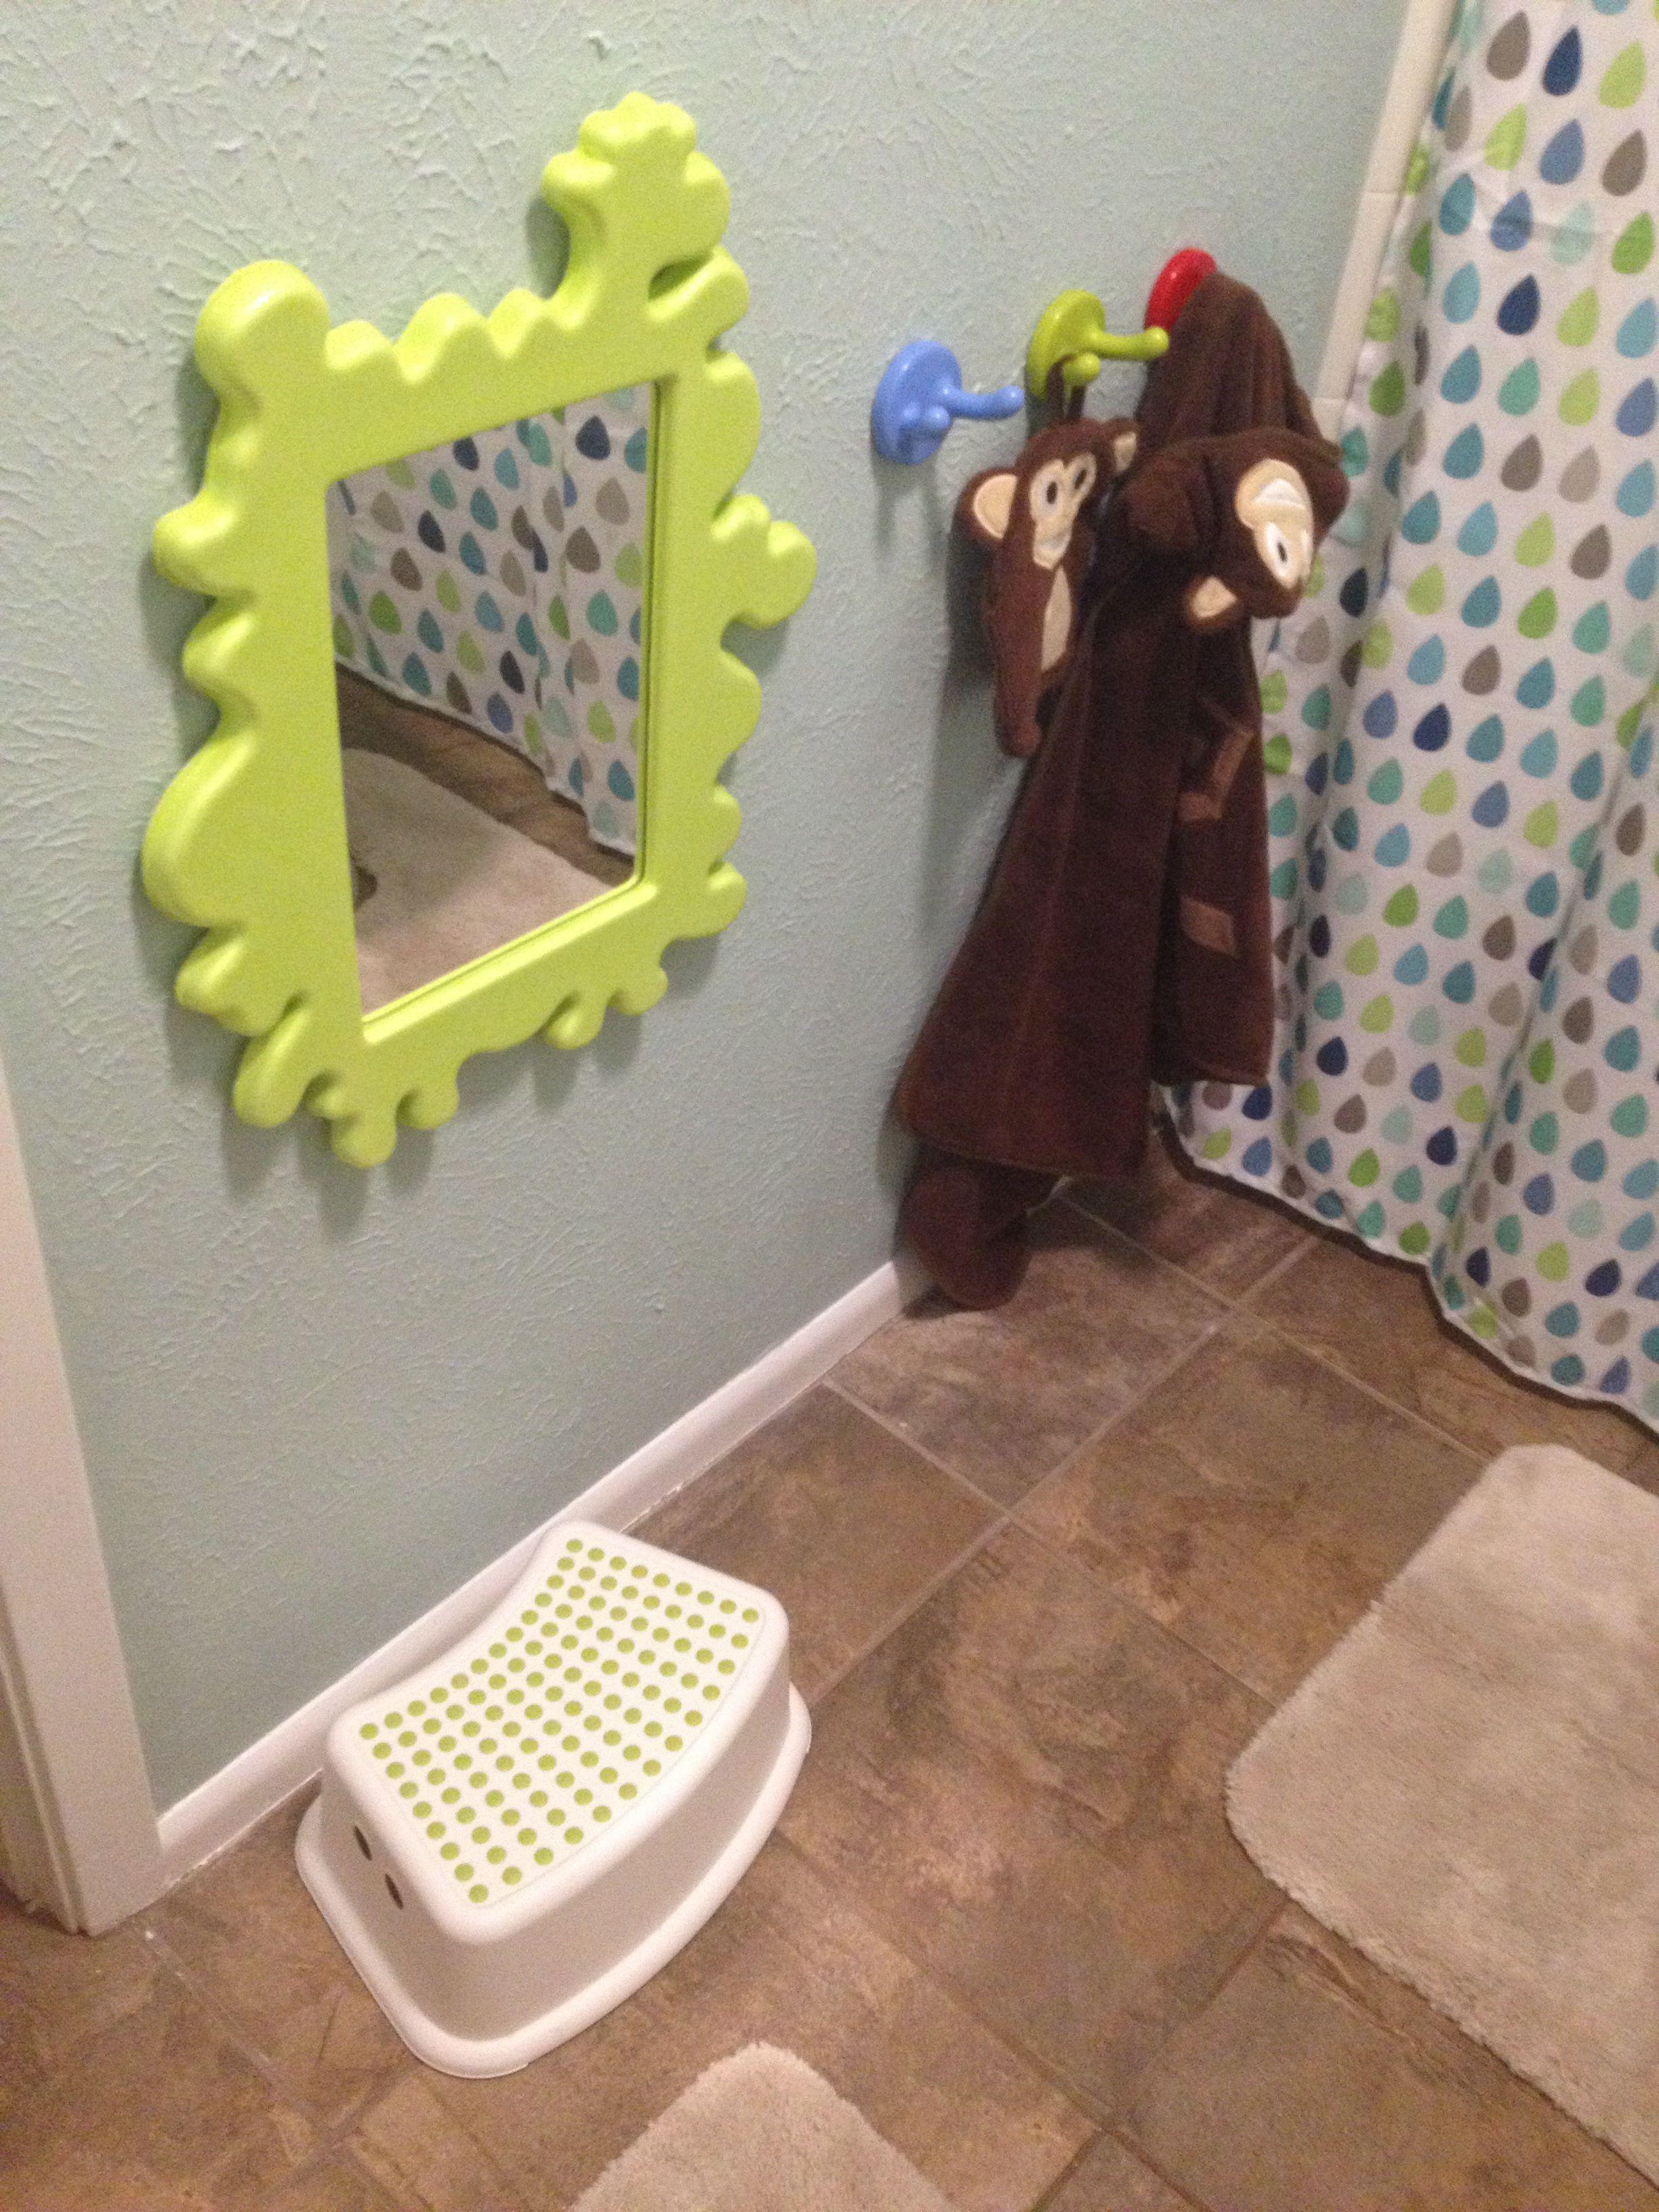 Ikea Toddler Hooks And Mirror In Bathroom Bathroom Kids Kid